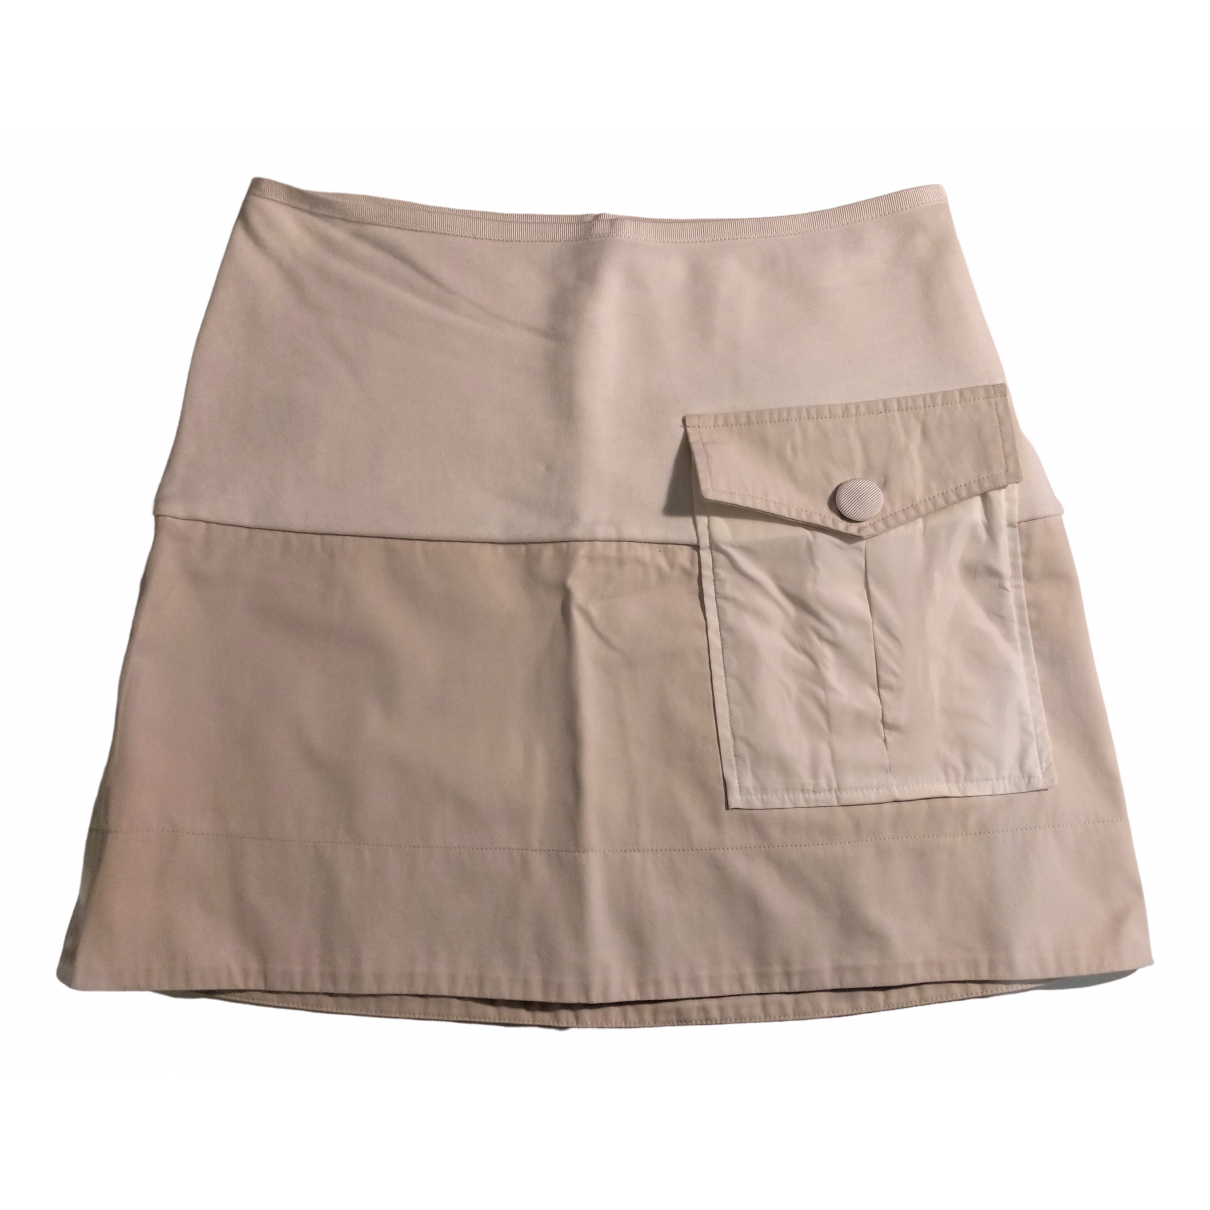 Moncler \N Beige Cotton skirt for Women XS International